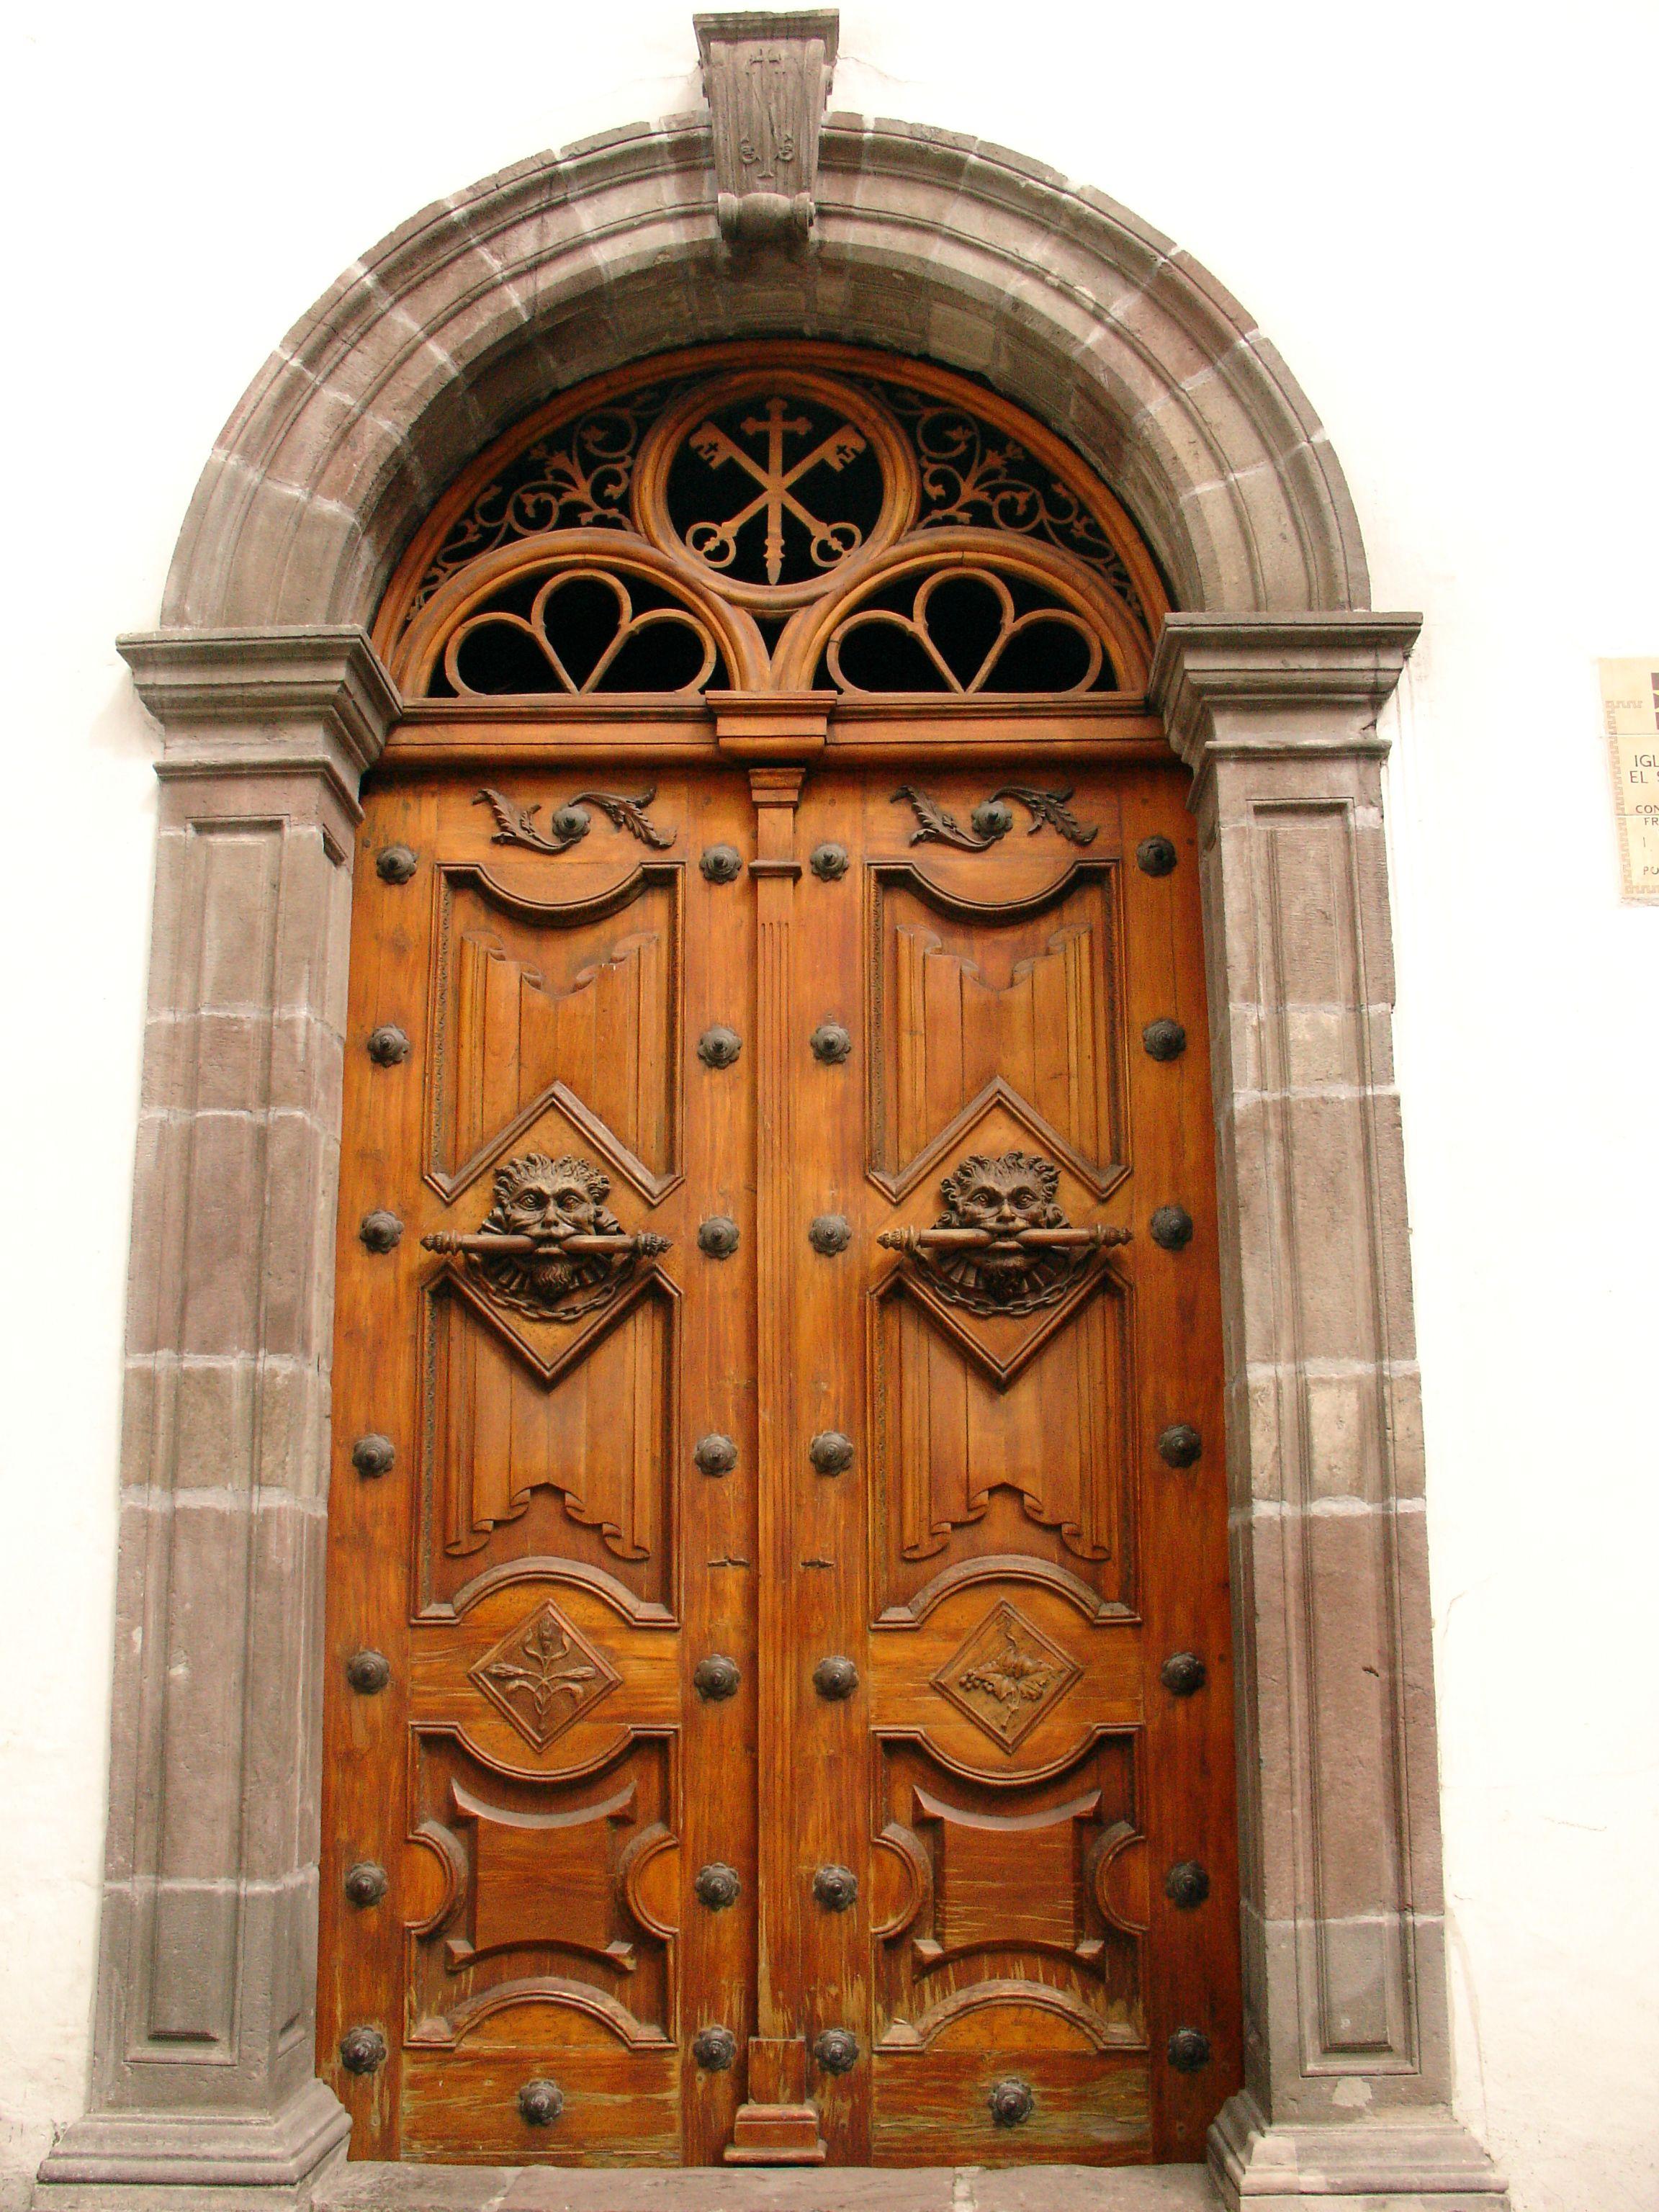 Puerta iglesia antigua centro historico de quito for Puertas de cuarterones antiguas